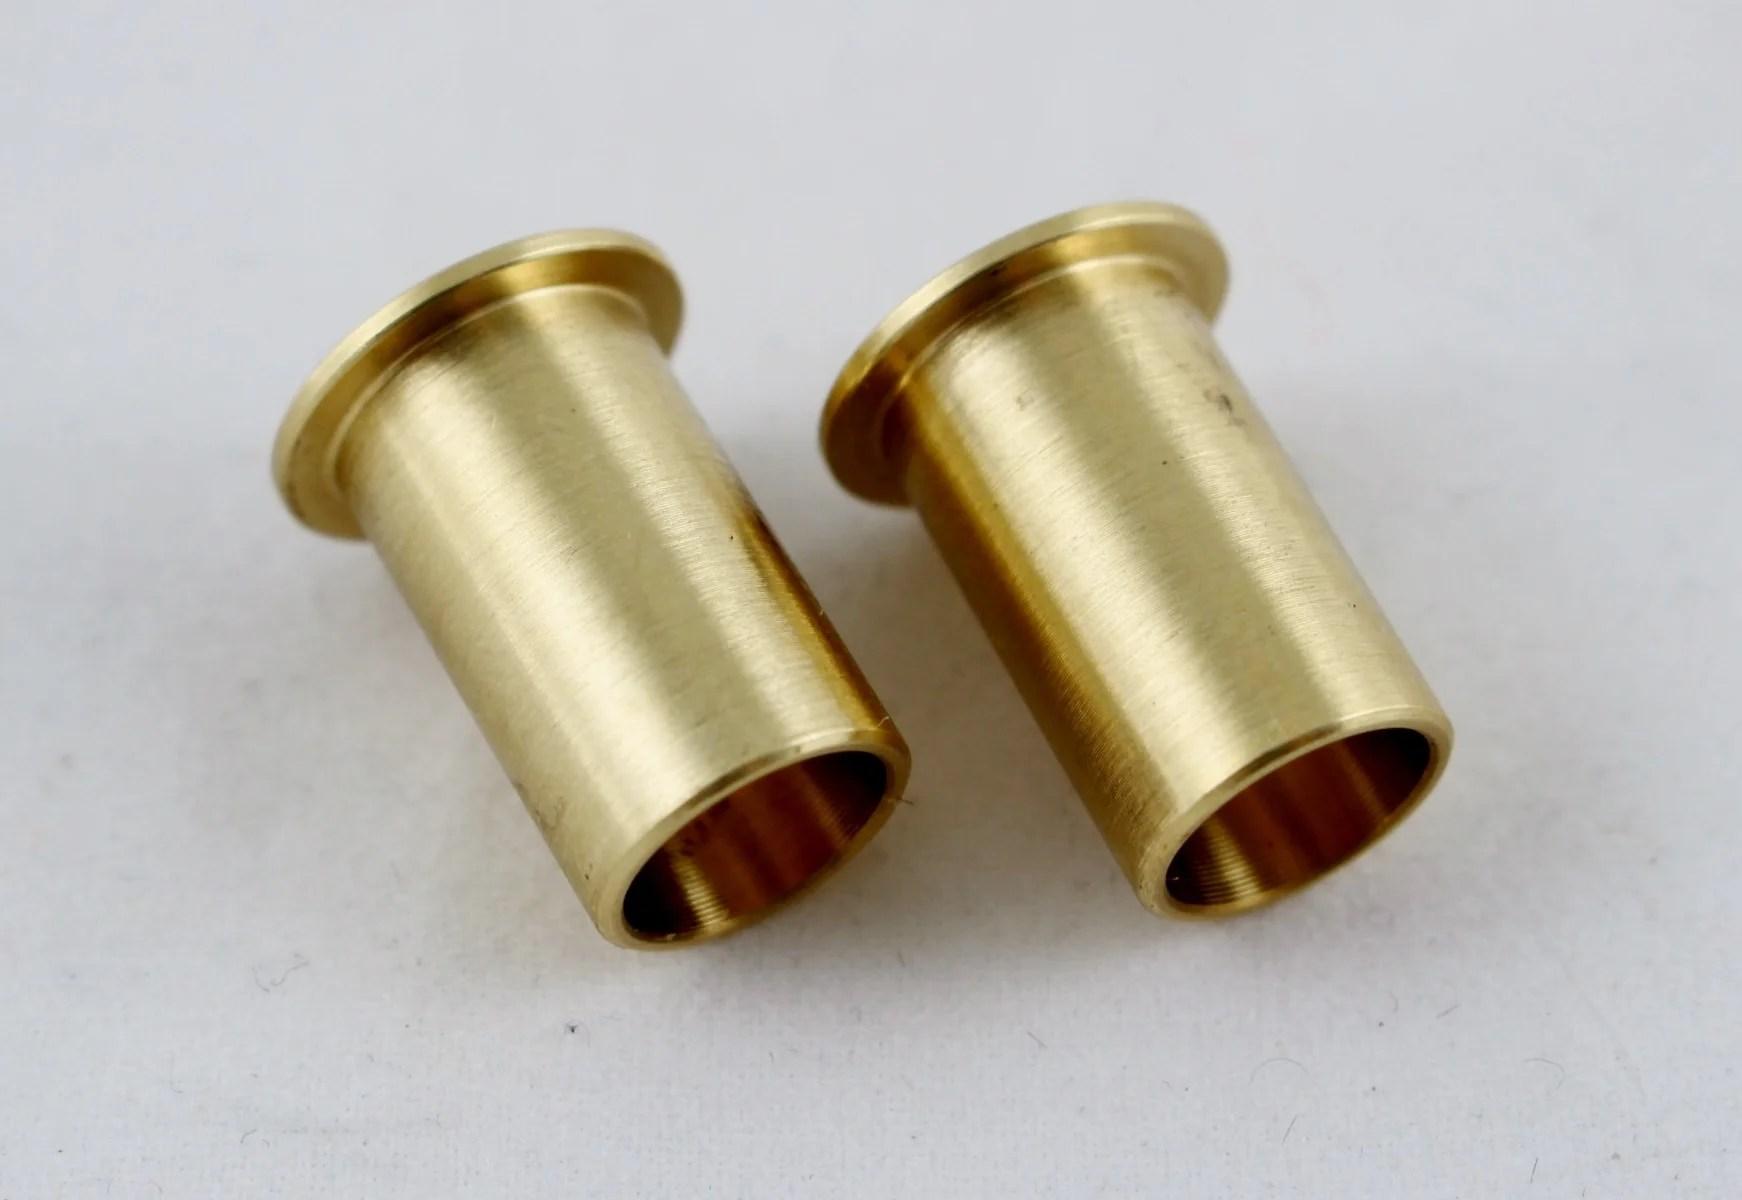 89 98 cummins bell crank throttle shaft linkage bushings pair brass upgrade [ 1742 x 1200 Pixel ]